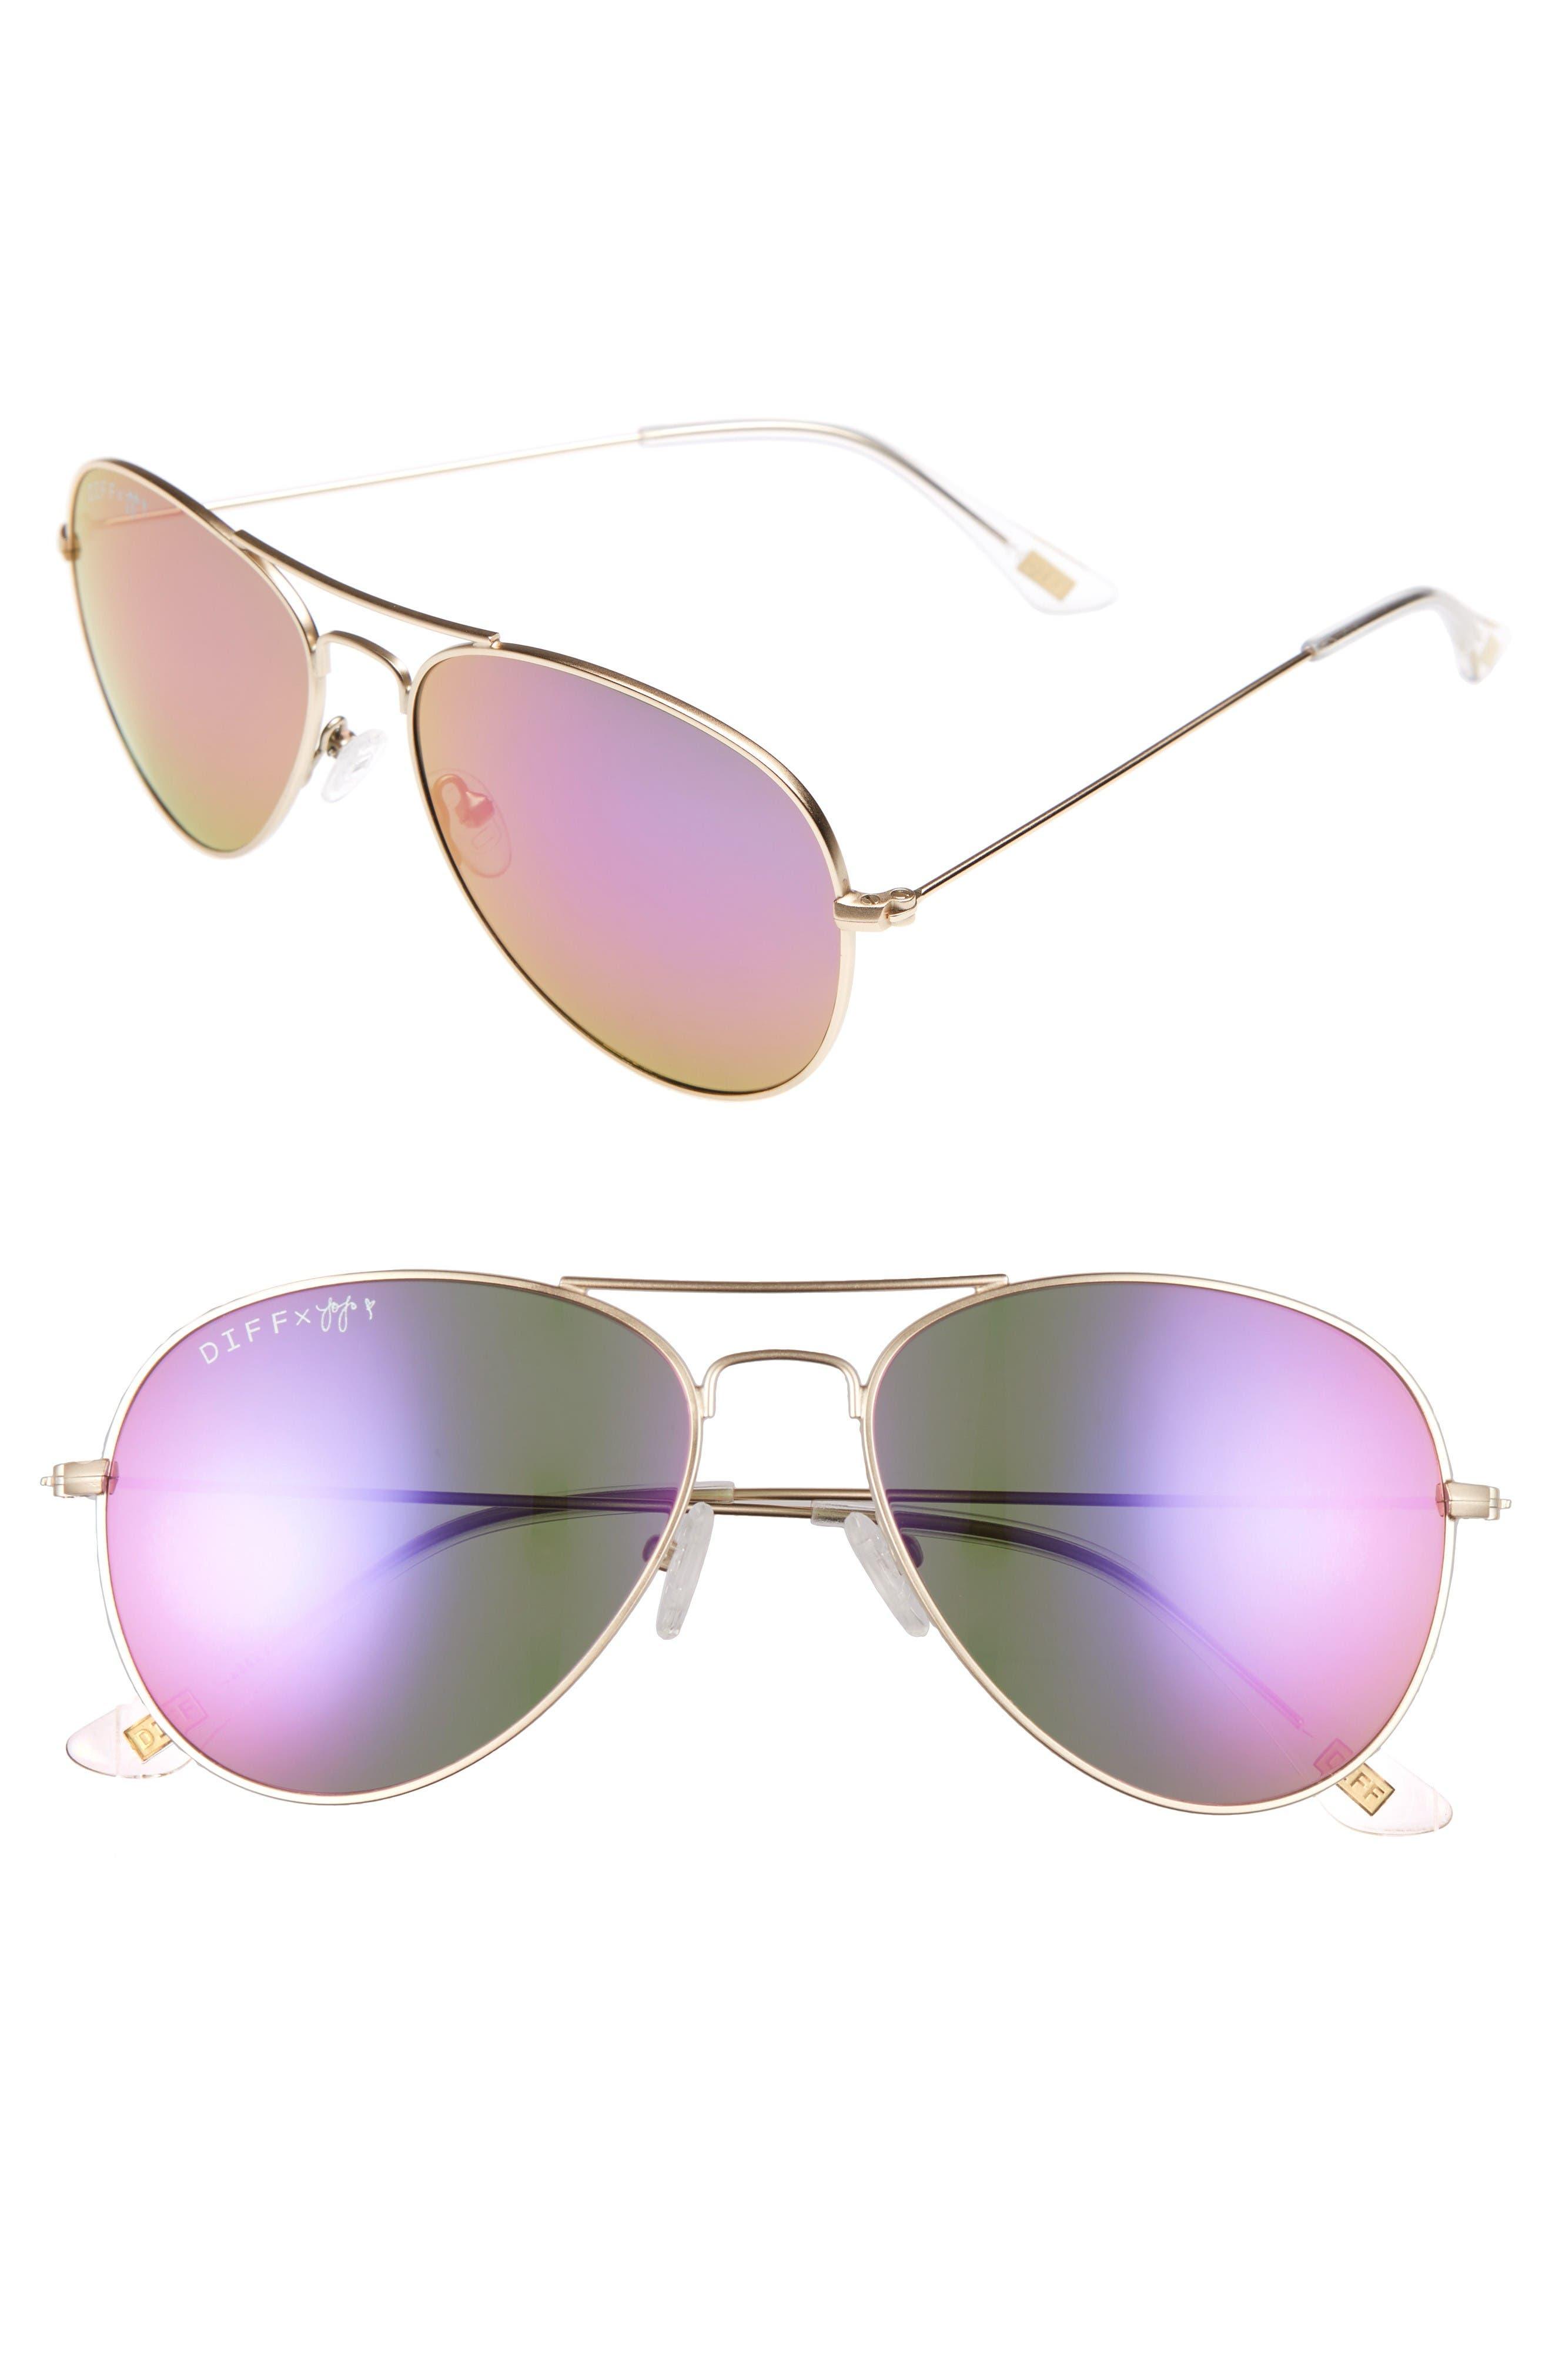 Main Image - DIFF x JoJo Cruz Edition 57mm Aviator Sunglasses